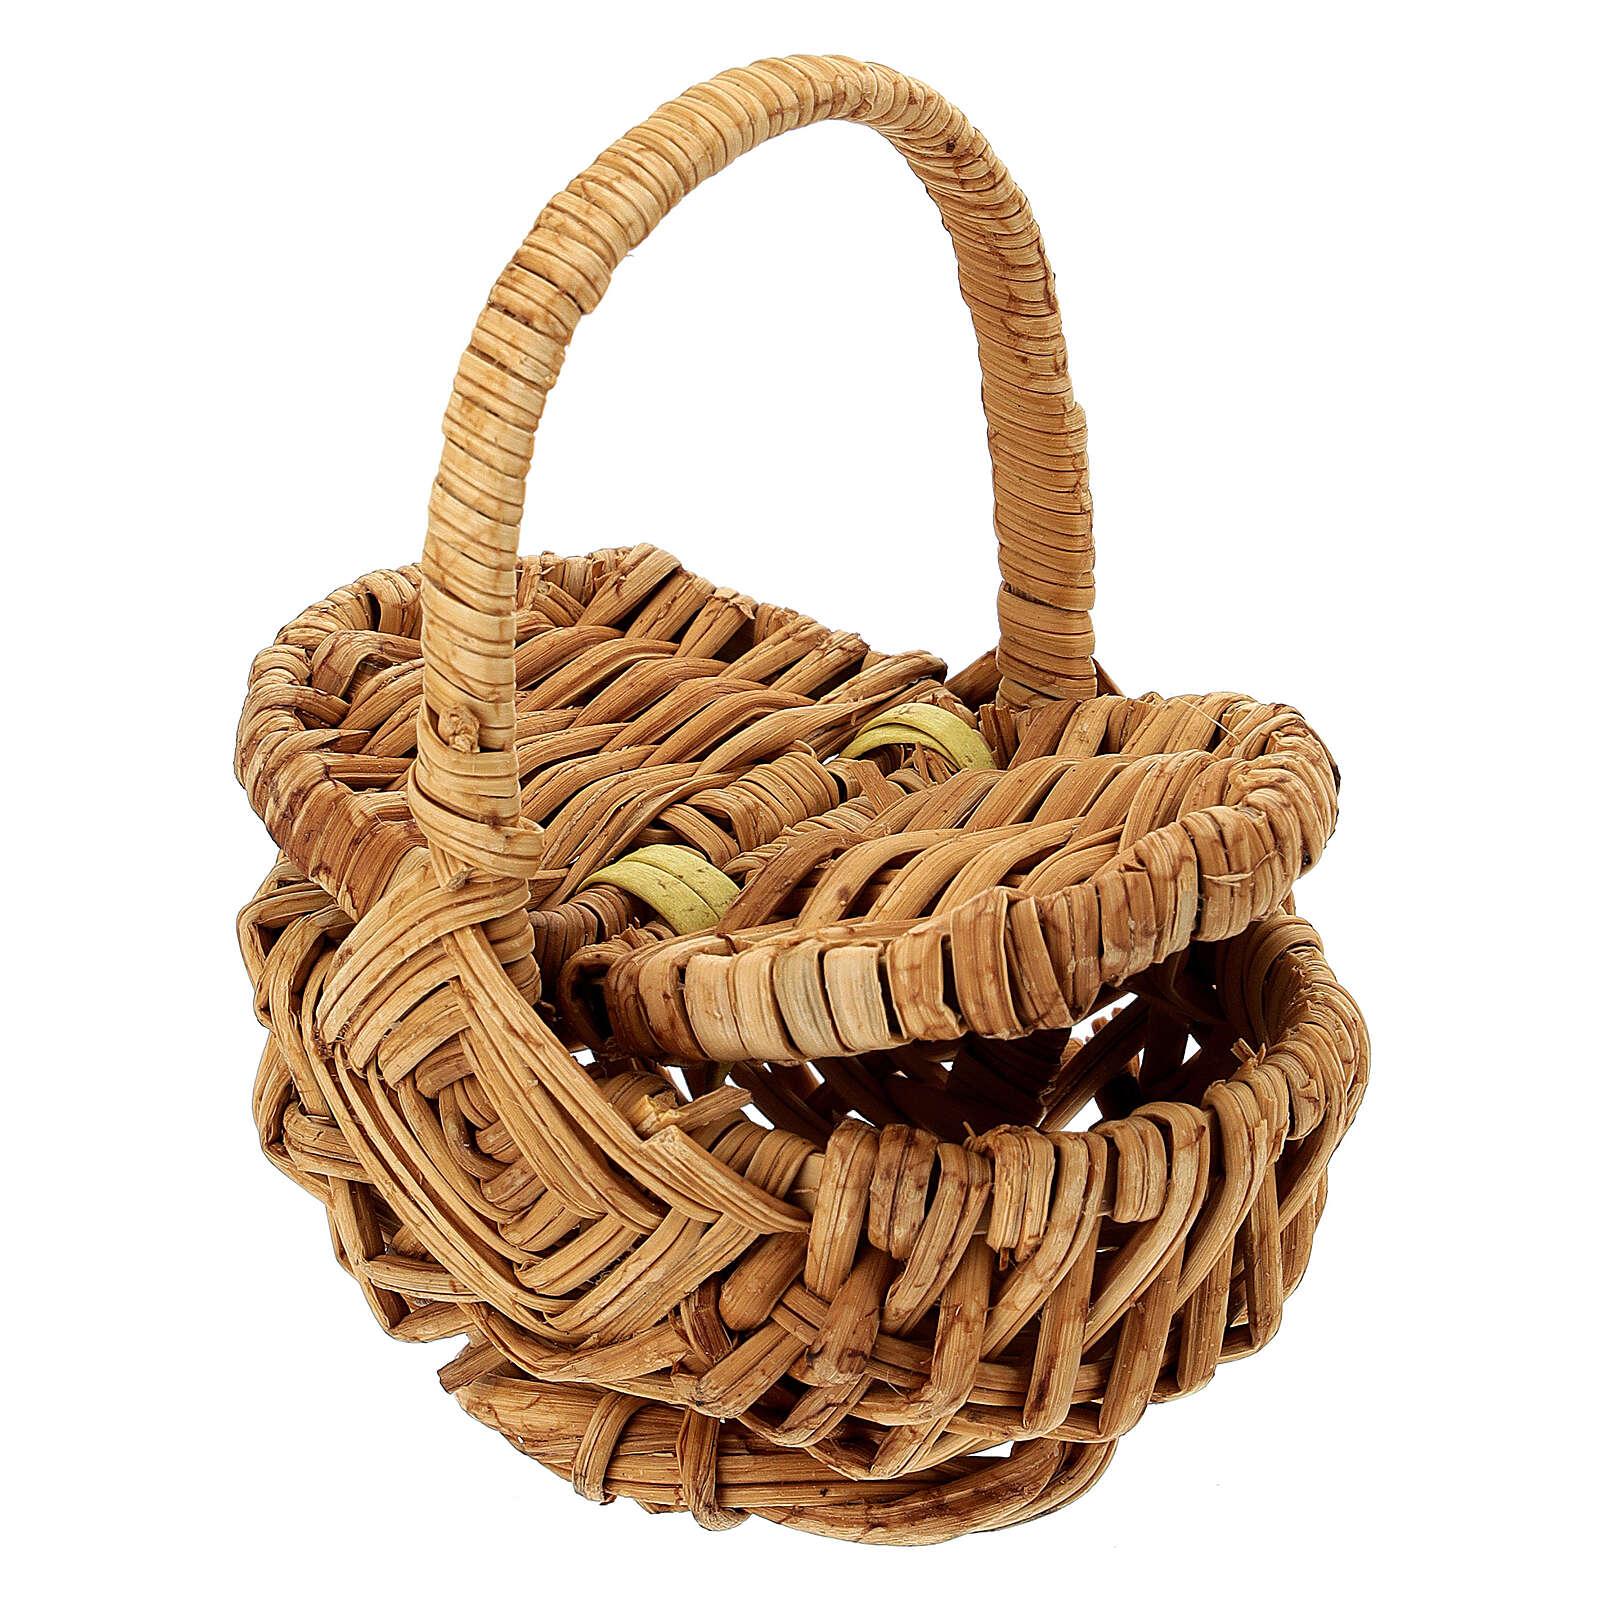 Openable picnic basket Nativity scene 18 cm 4